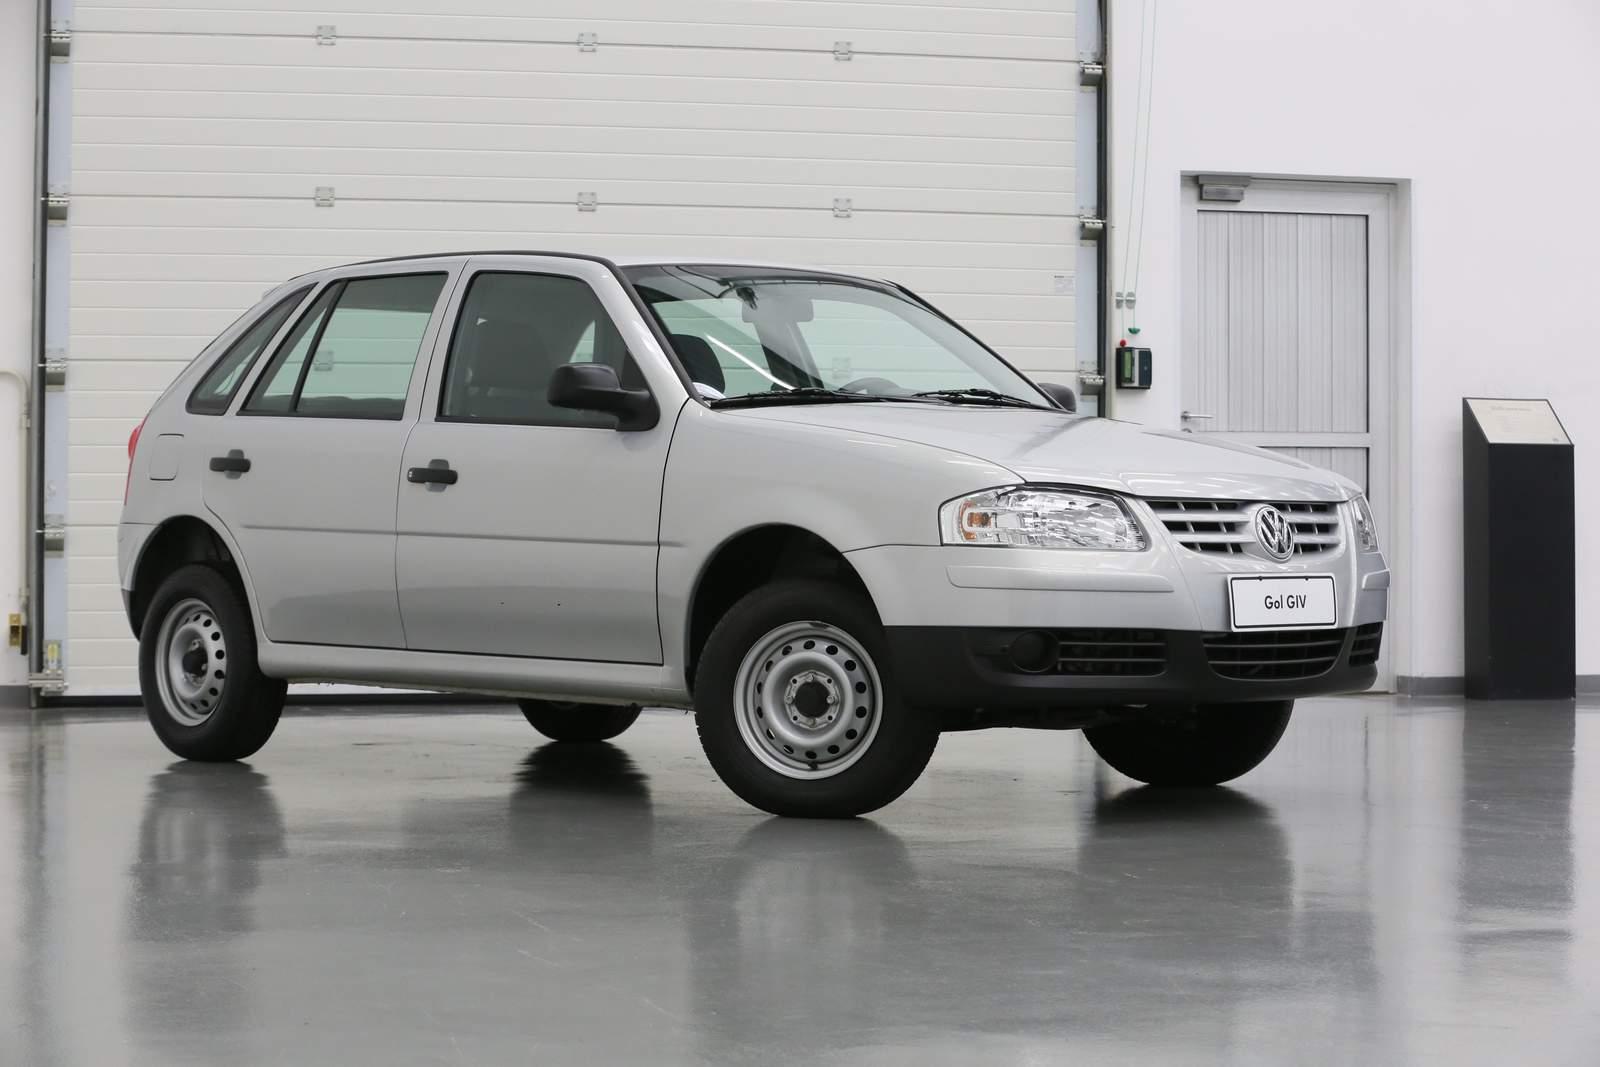 VW Gol G4